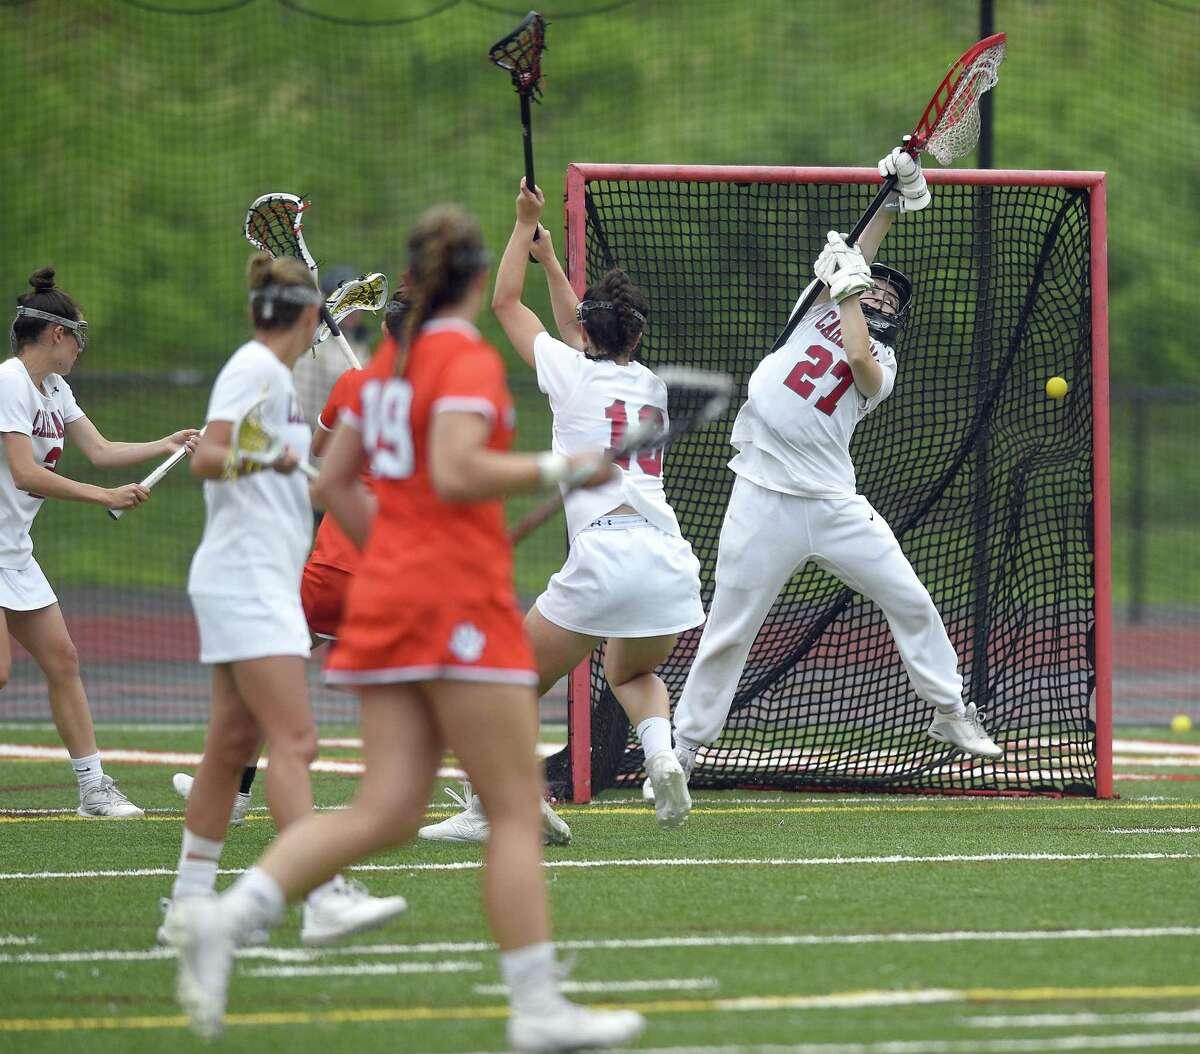 Greenwich goalie Sloane Loveless is scored onl by Ridgefield Caitlin Slaminko (4) in a CIAC Class L girls lacrosse quarter final game at Cardinal Stadium on May 31, 2018 in Greenwich, Connecticut. Ridgefield defeated Greenwich 7-6.